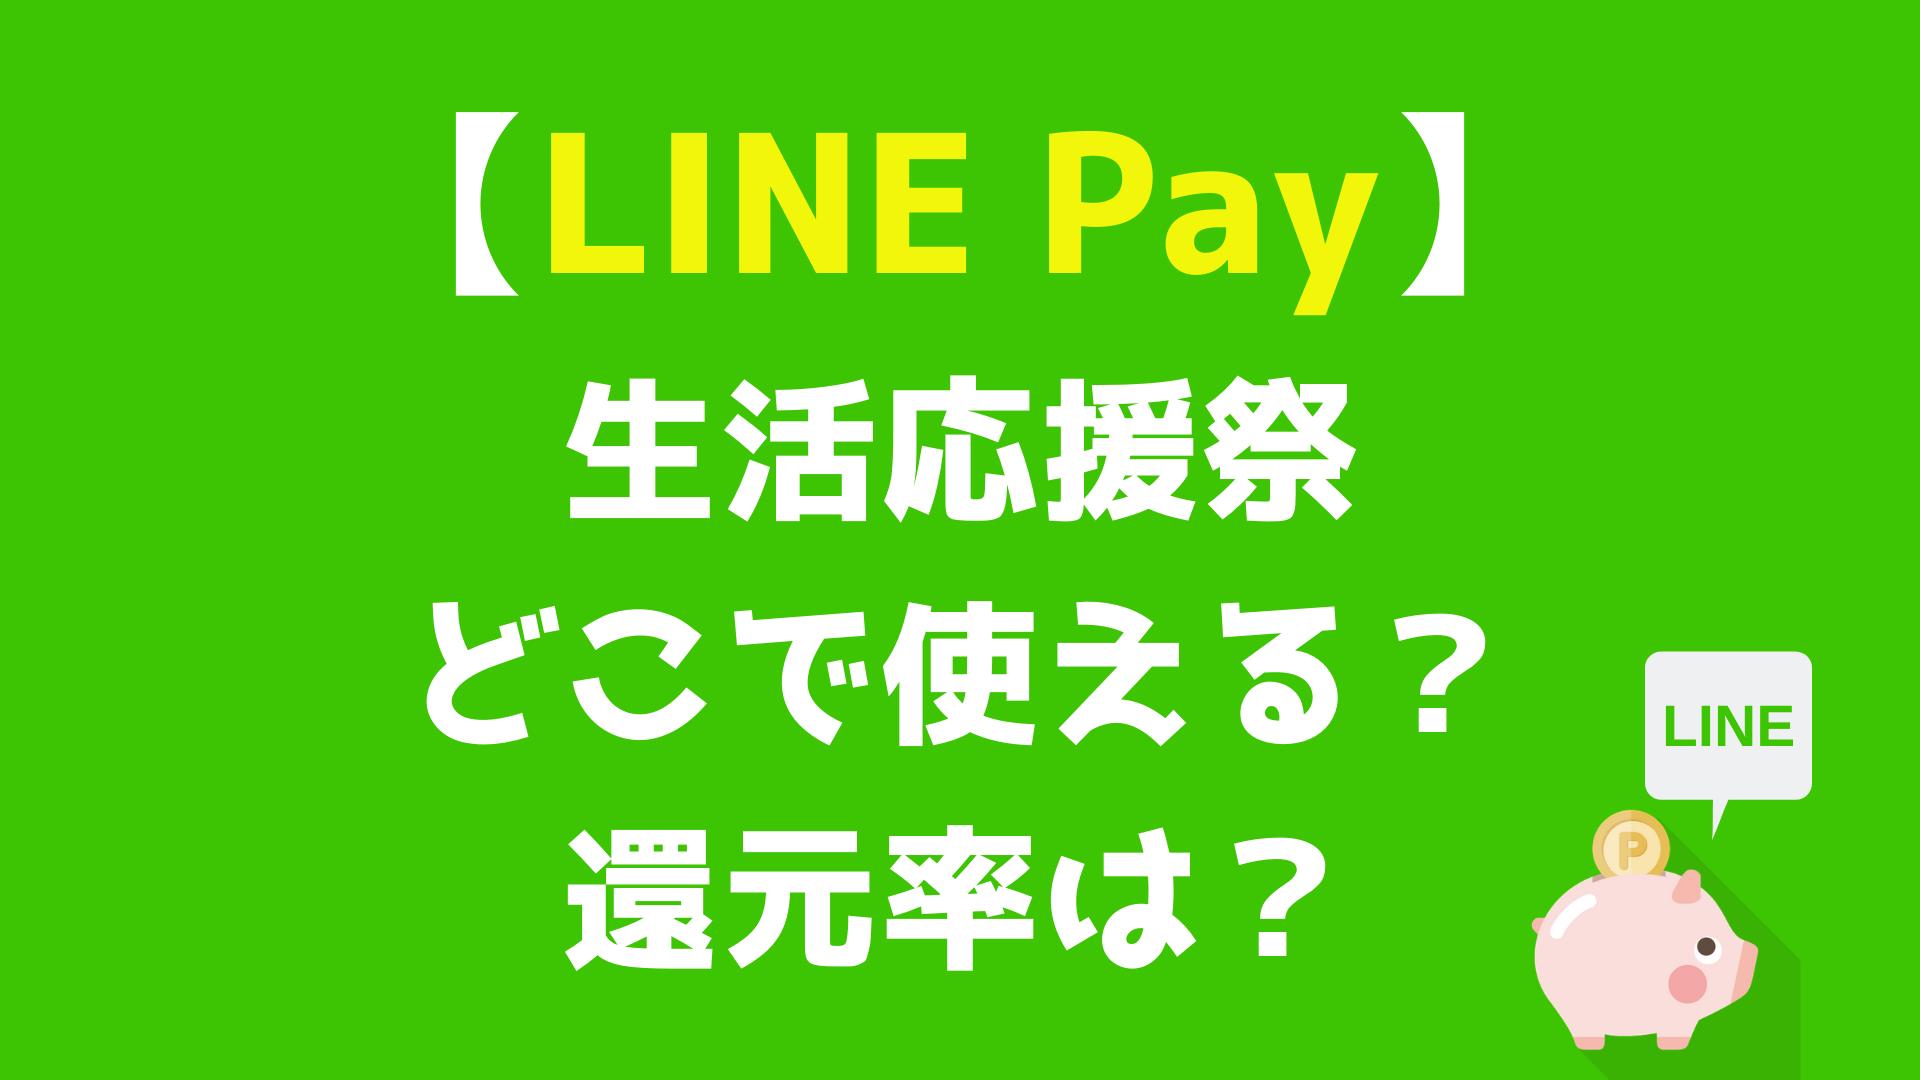 【LINE Pay】生活応援祭  どこで使える?還元率は?使い方を解説